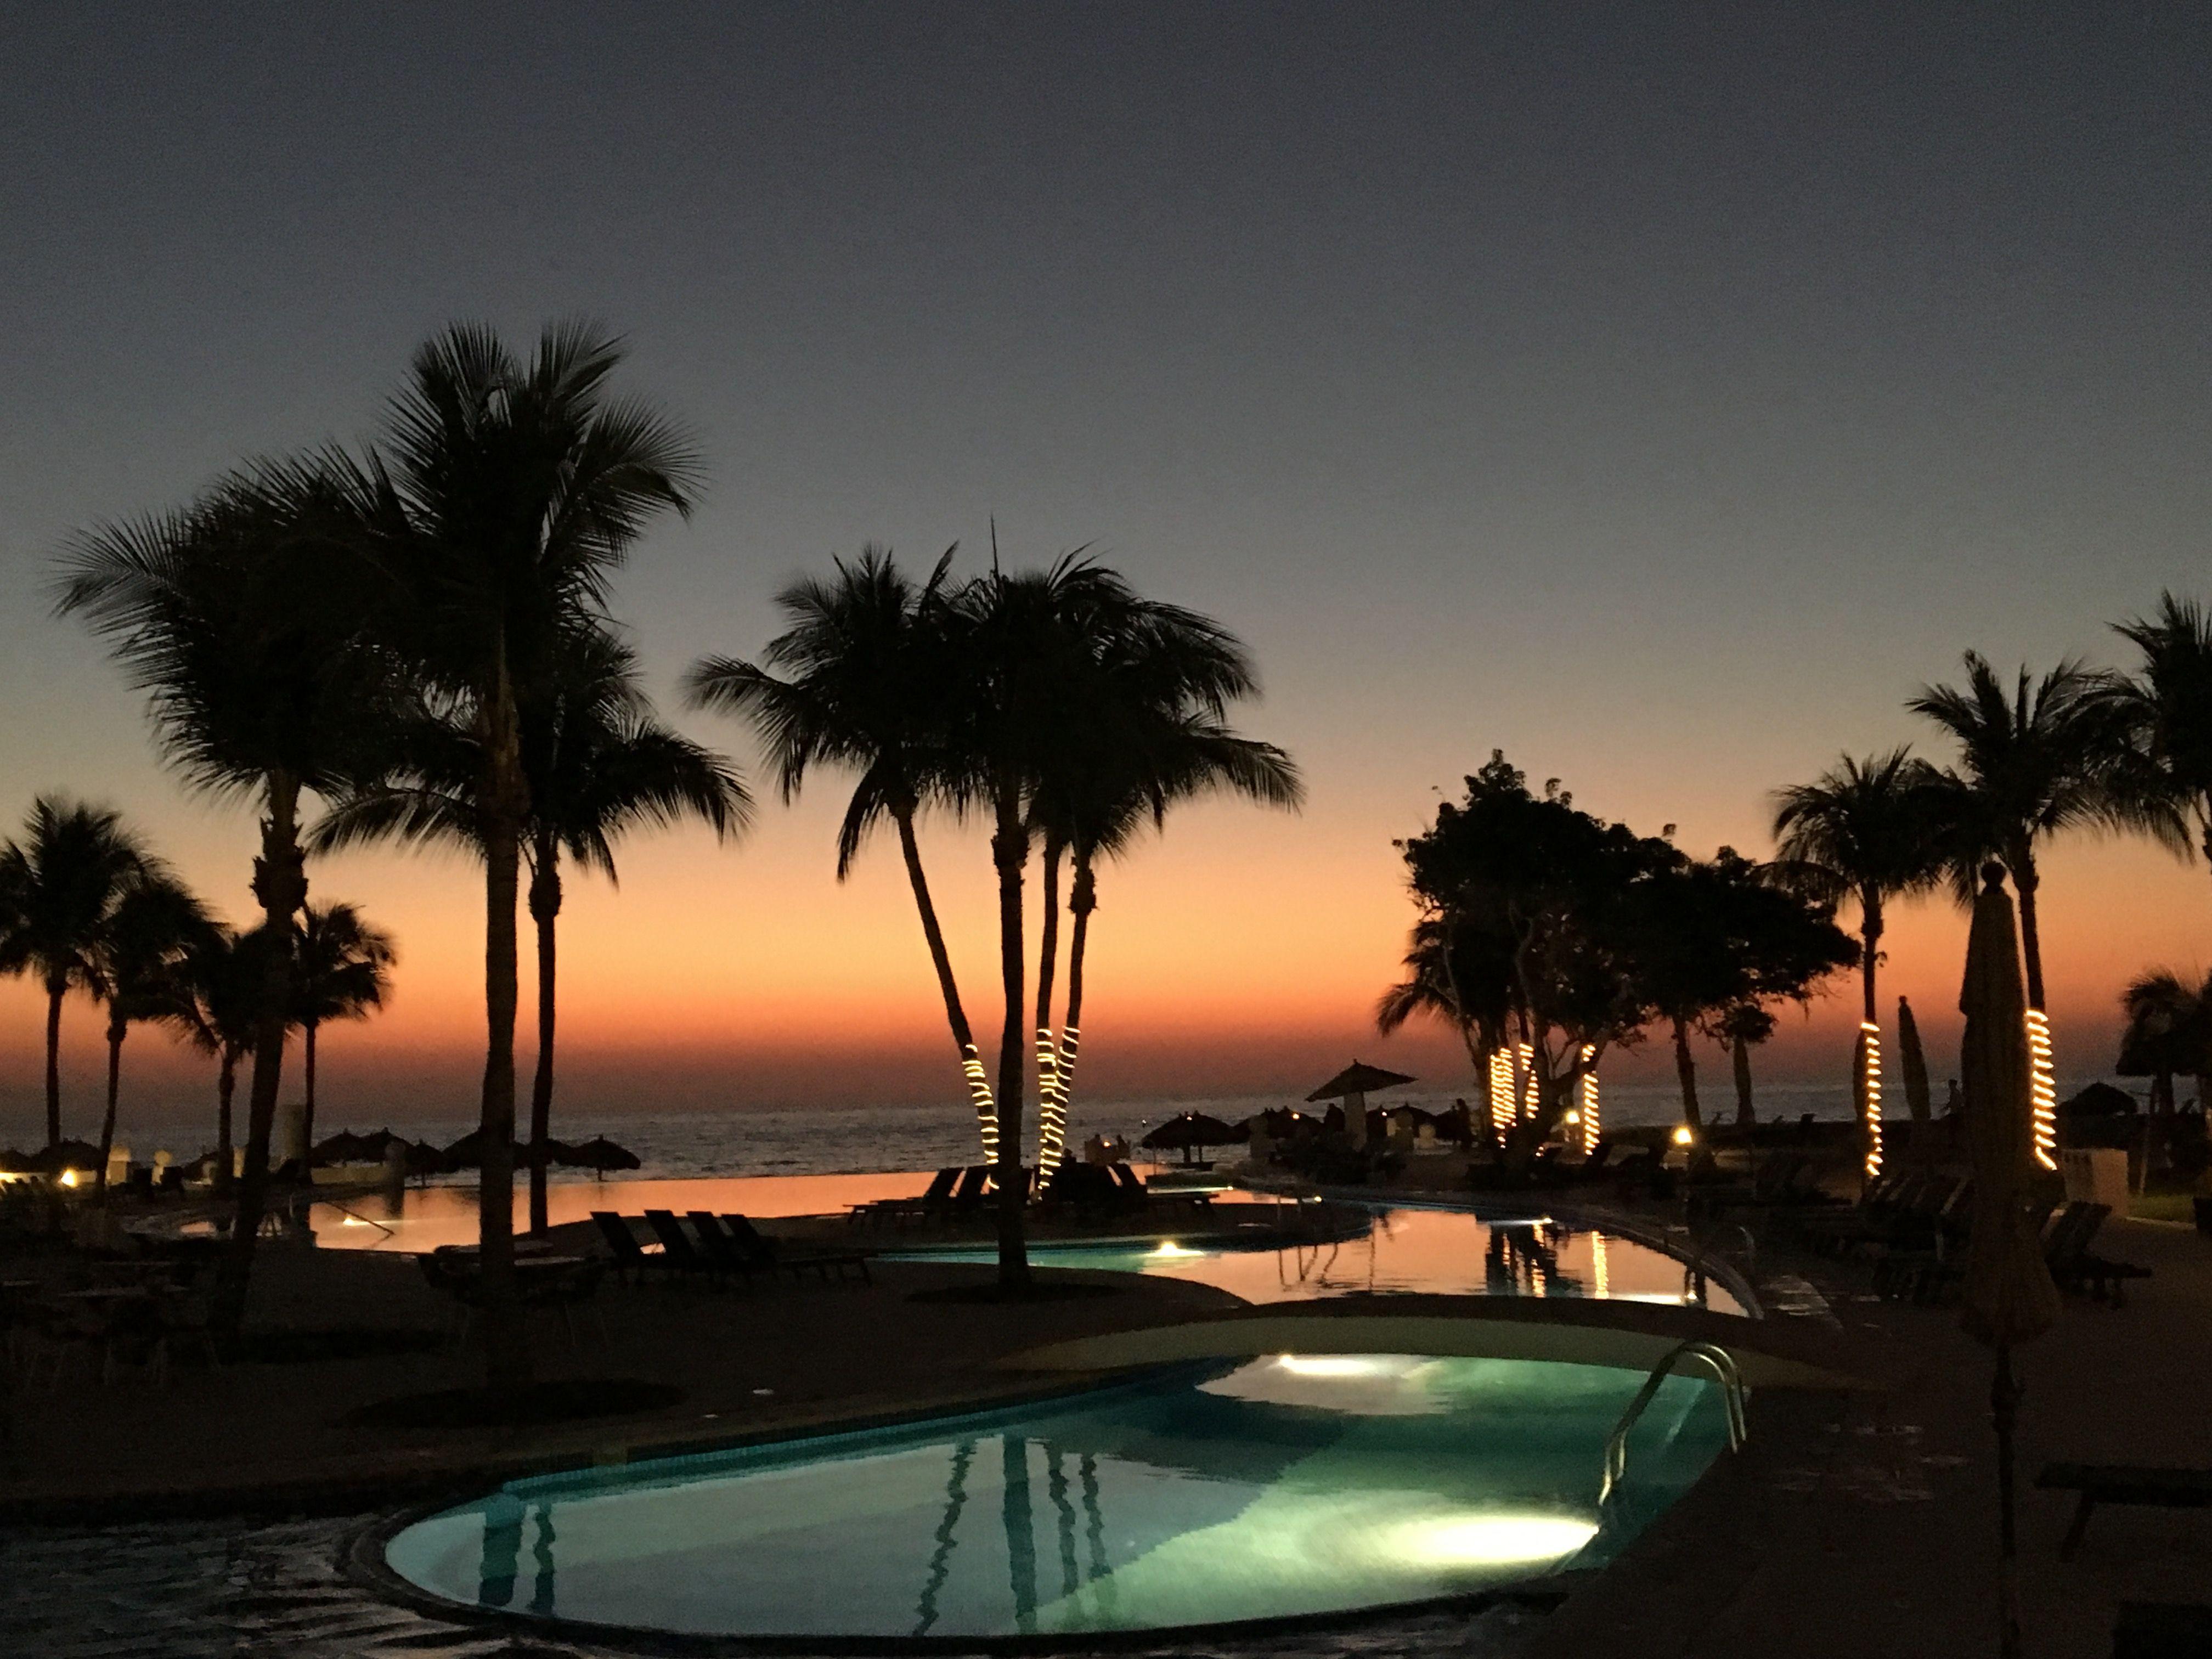 Dreams Villamagna sunset Extra Mile Travel www.extramile